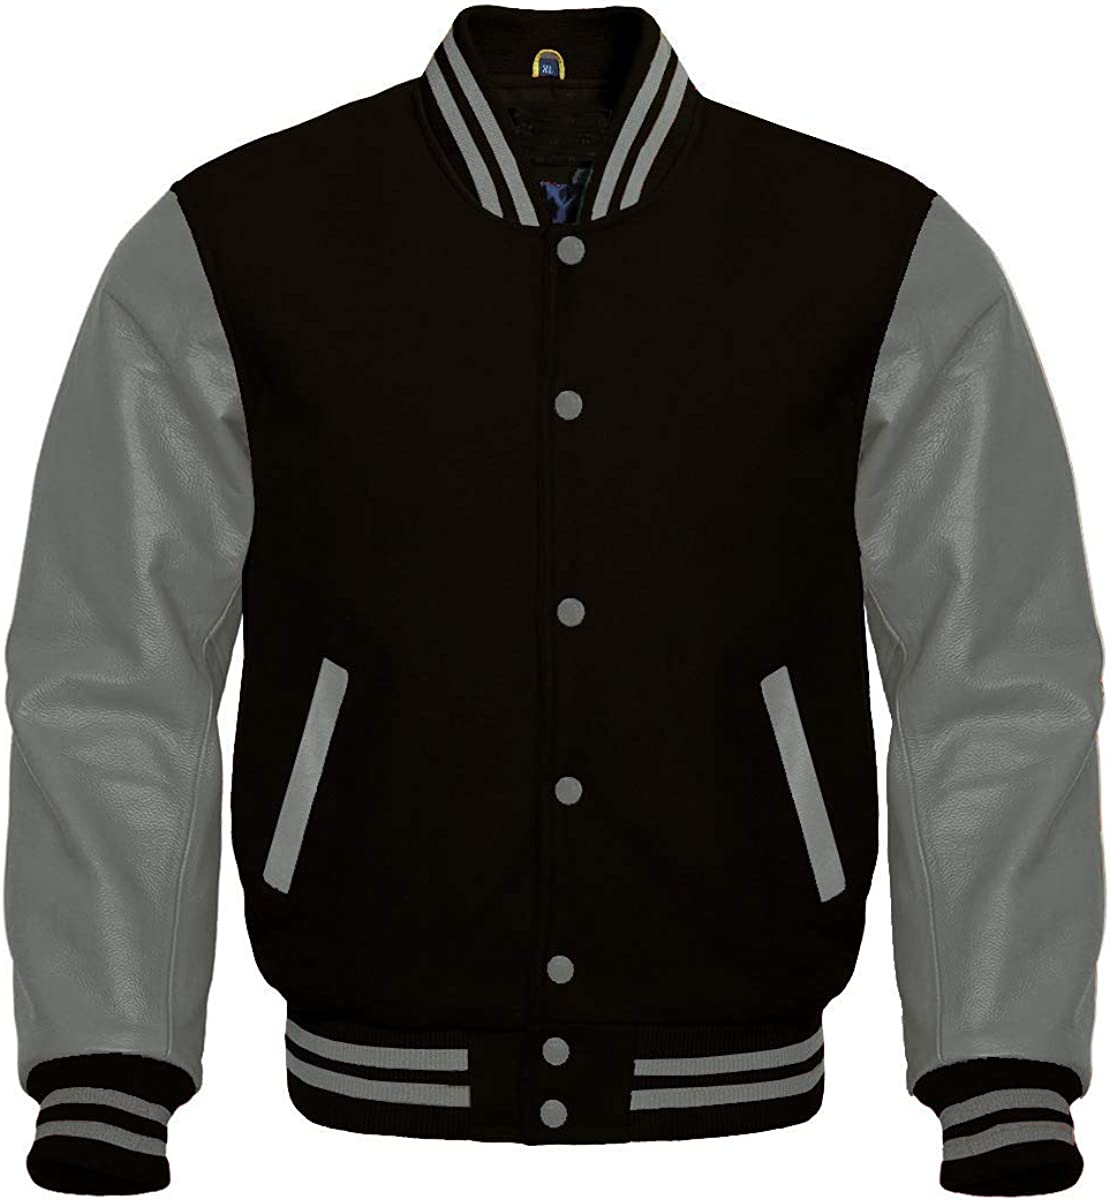 Apex Ltd Letterman Baseball School College Bomber Varsity Jacket Wool Blend & Genuine Leather Sleeves